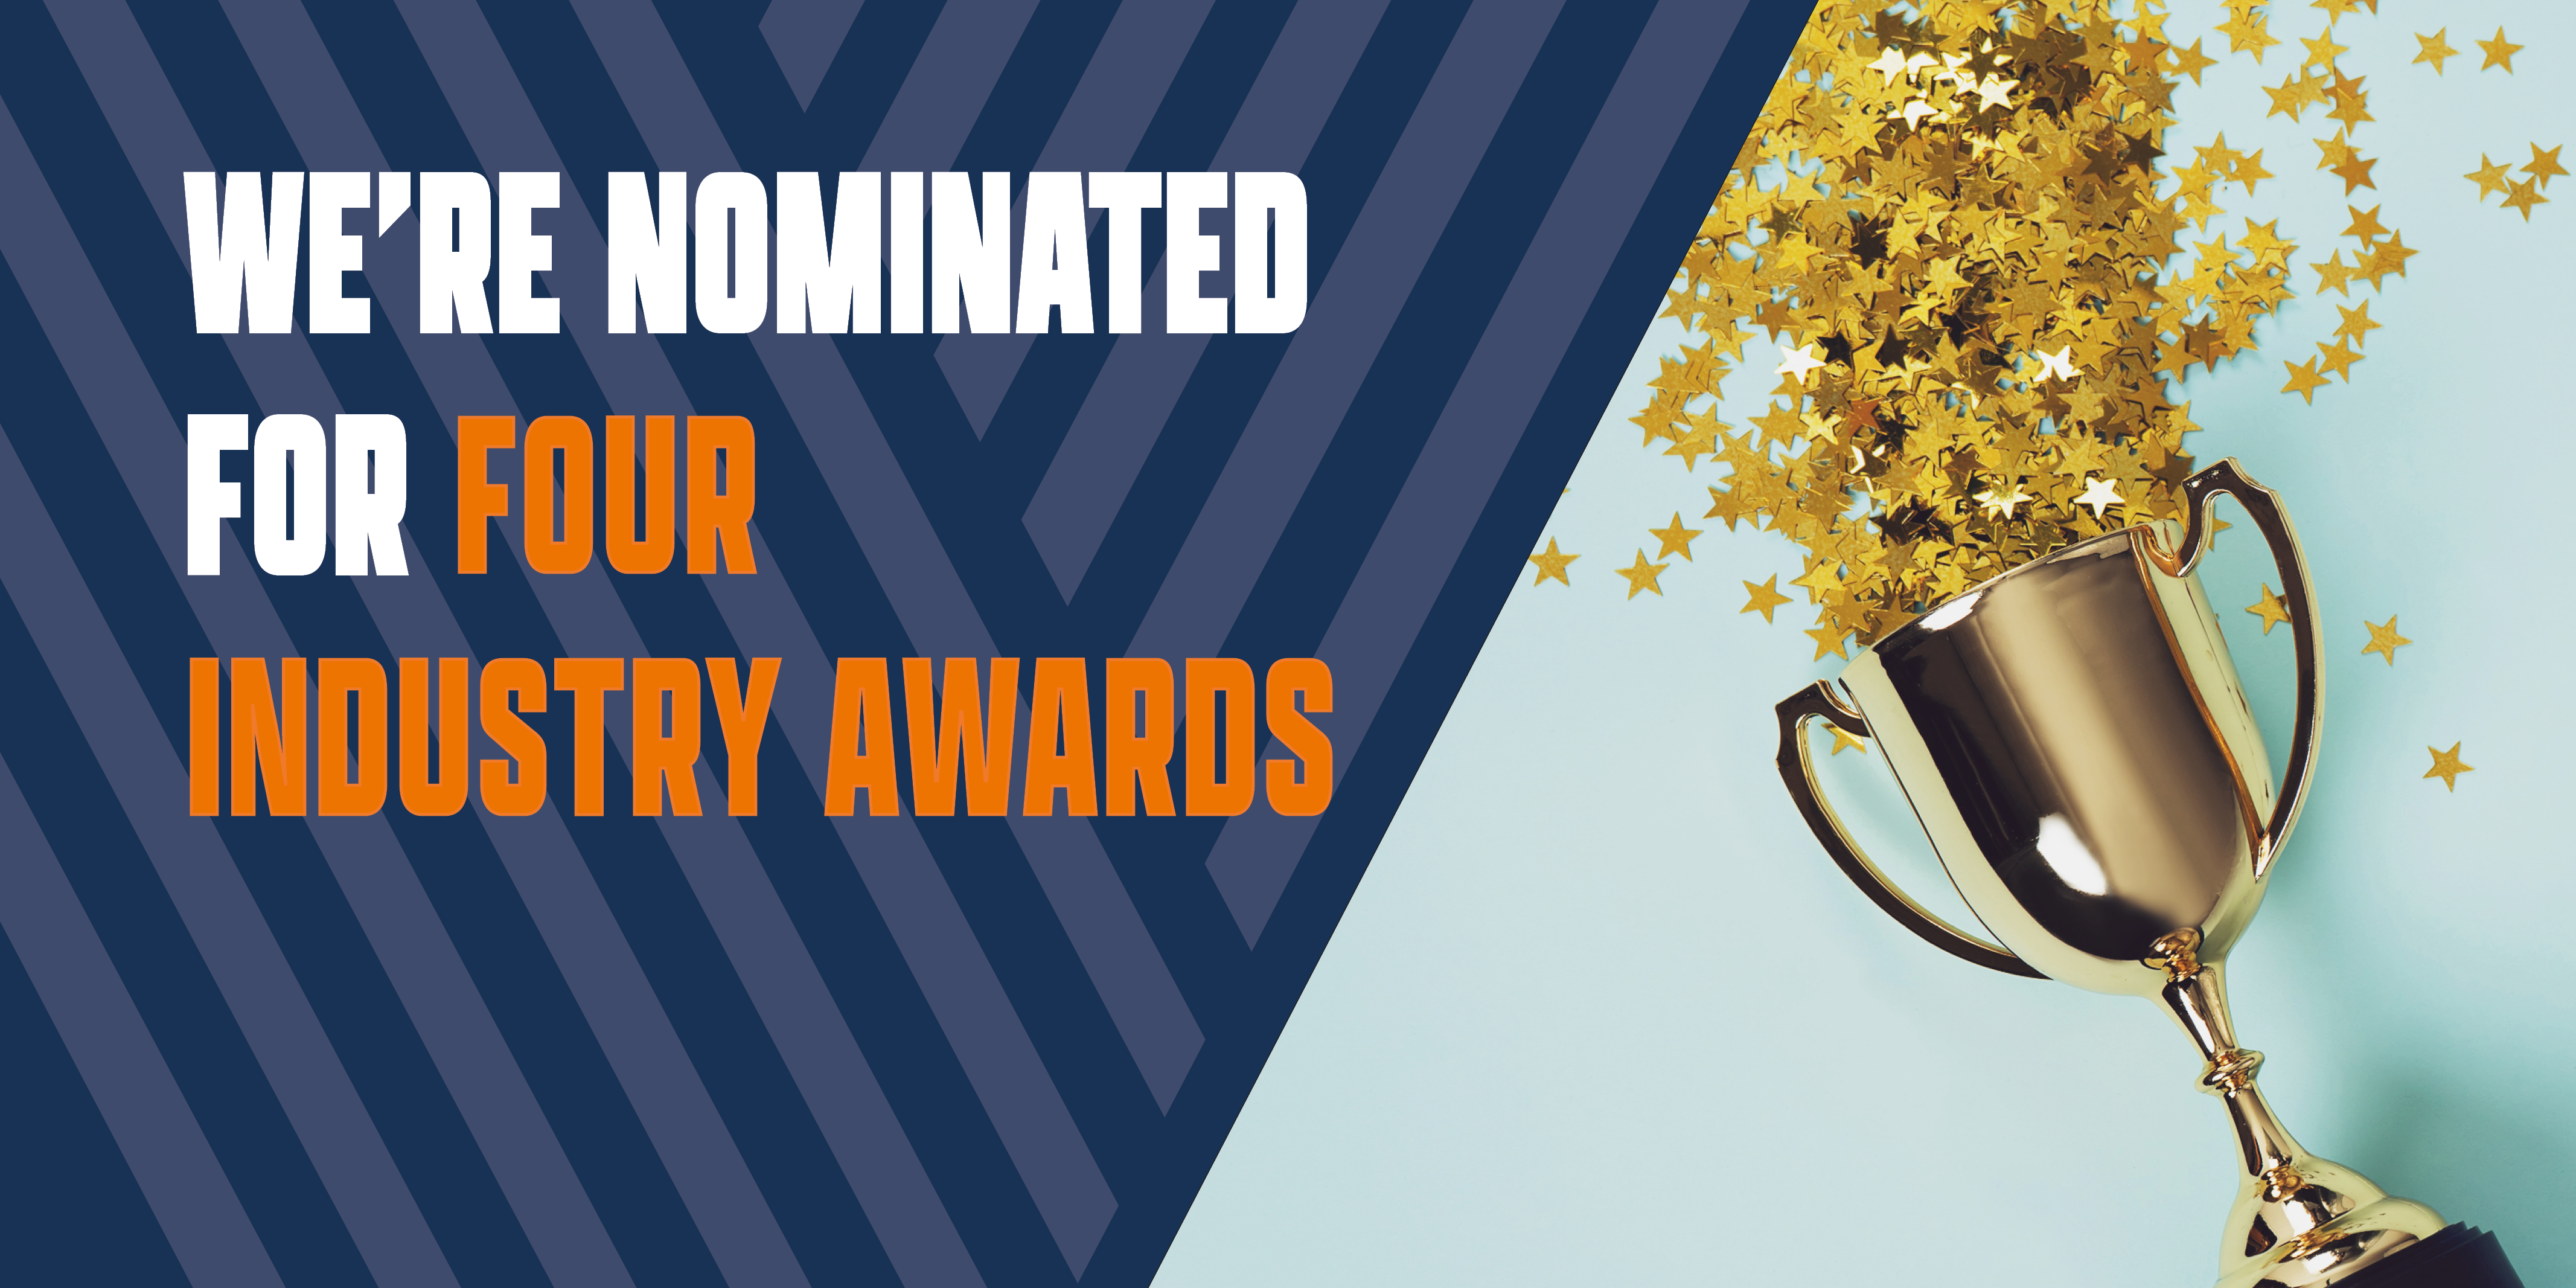 V12VF nominated for four industry awards